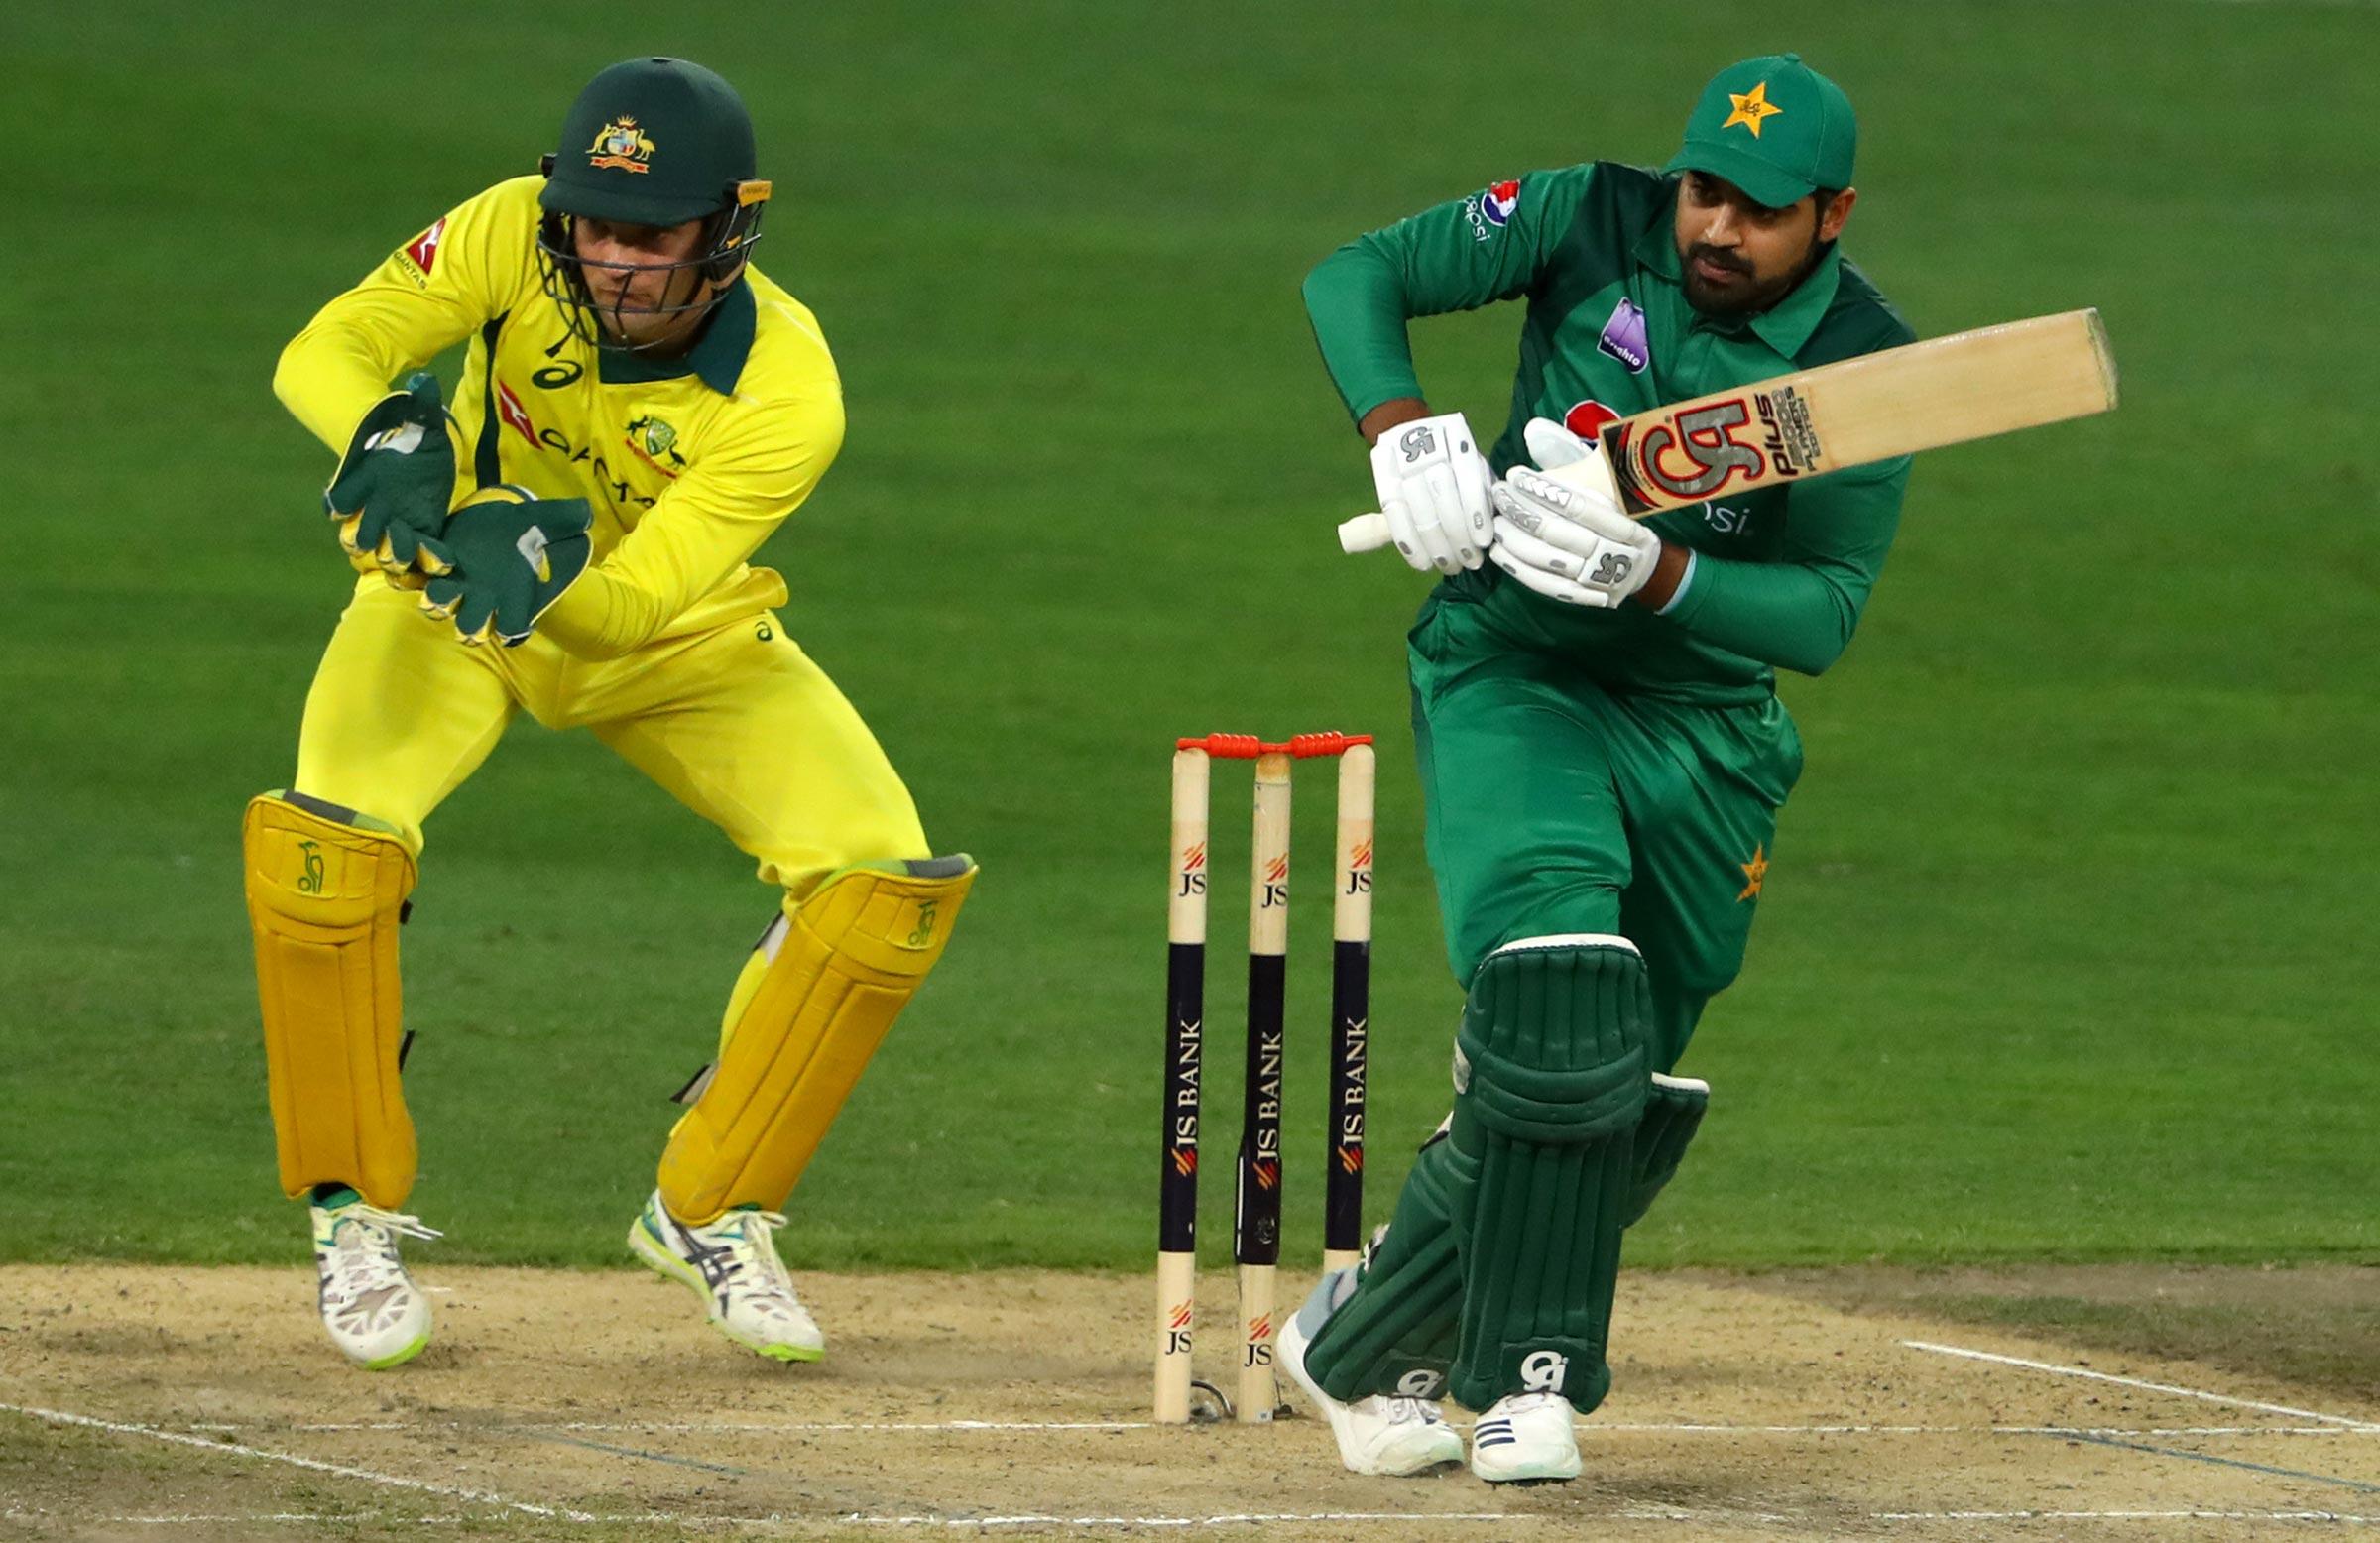 Haris Sohail's century wasn't enough for Pakistan // Getty